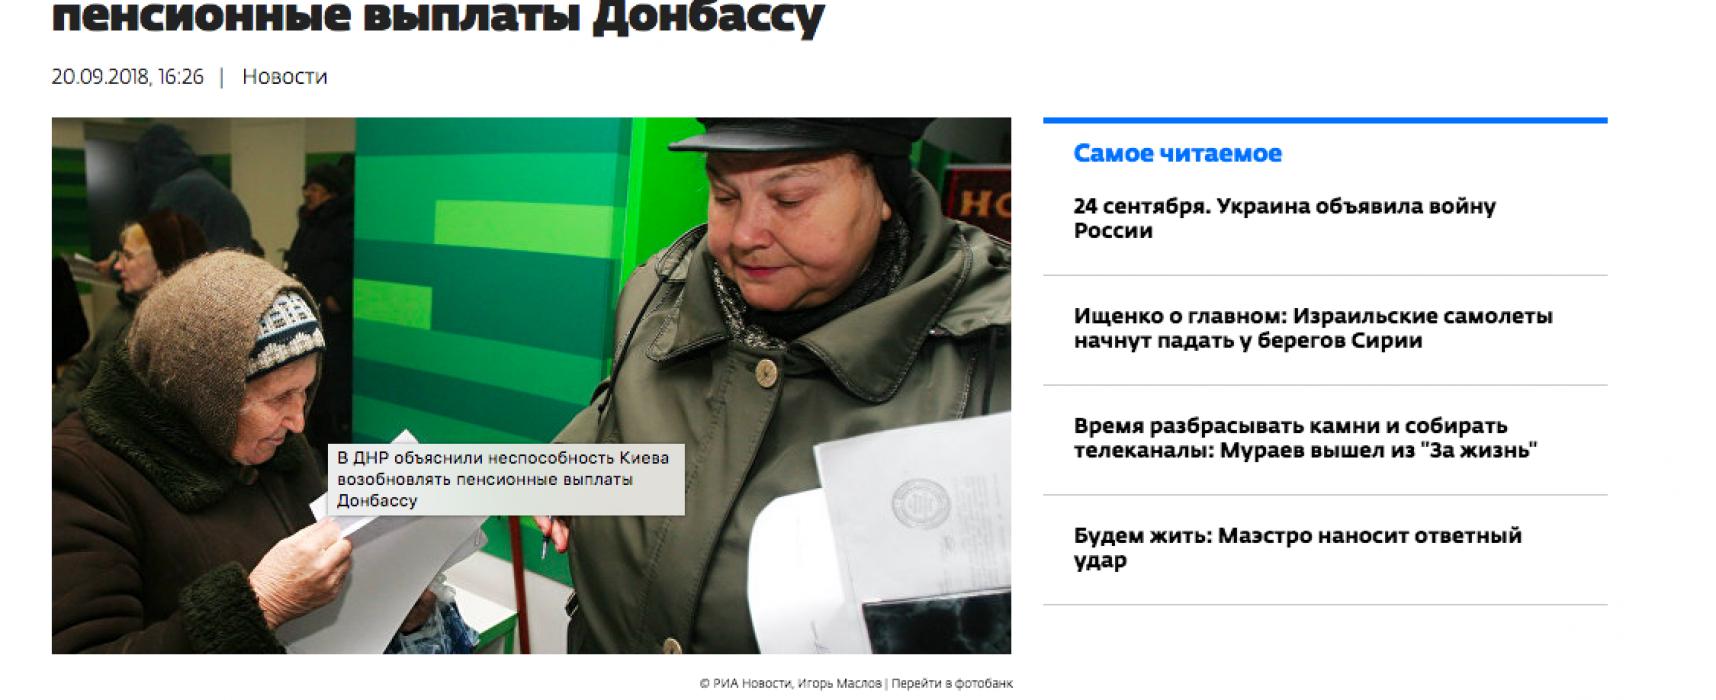 Фейк: Киев не платит пенсии жителям «ЛДНР» из-за «нехватки денег»